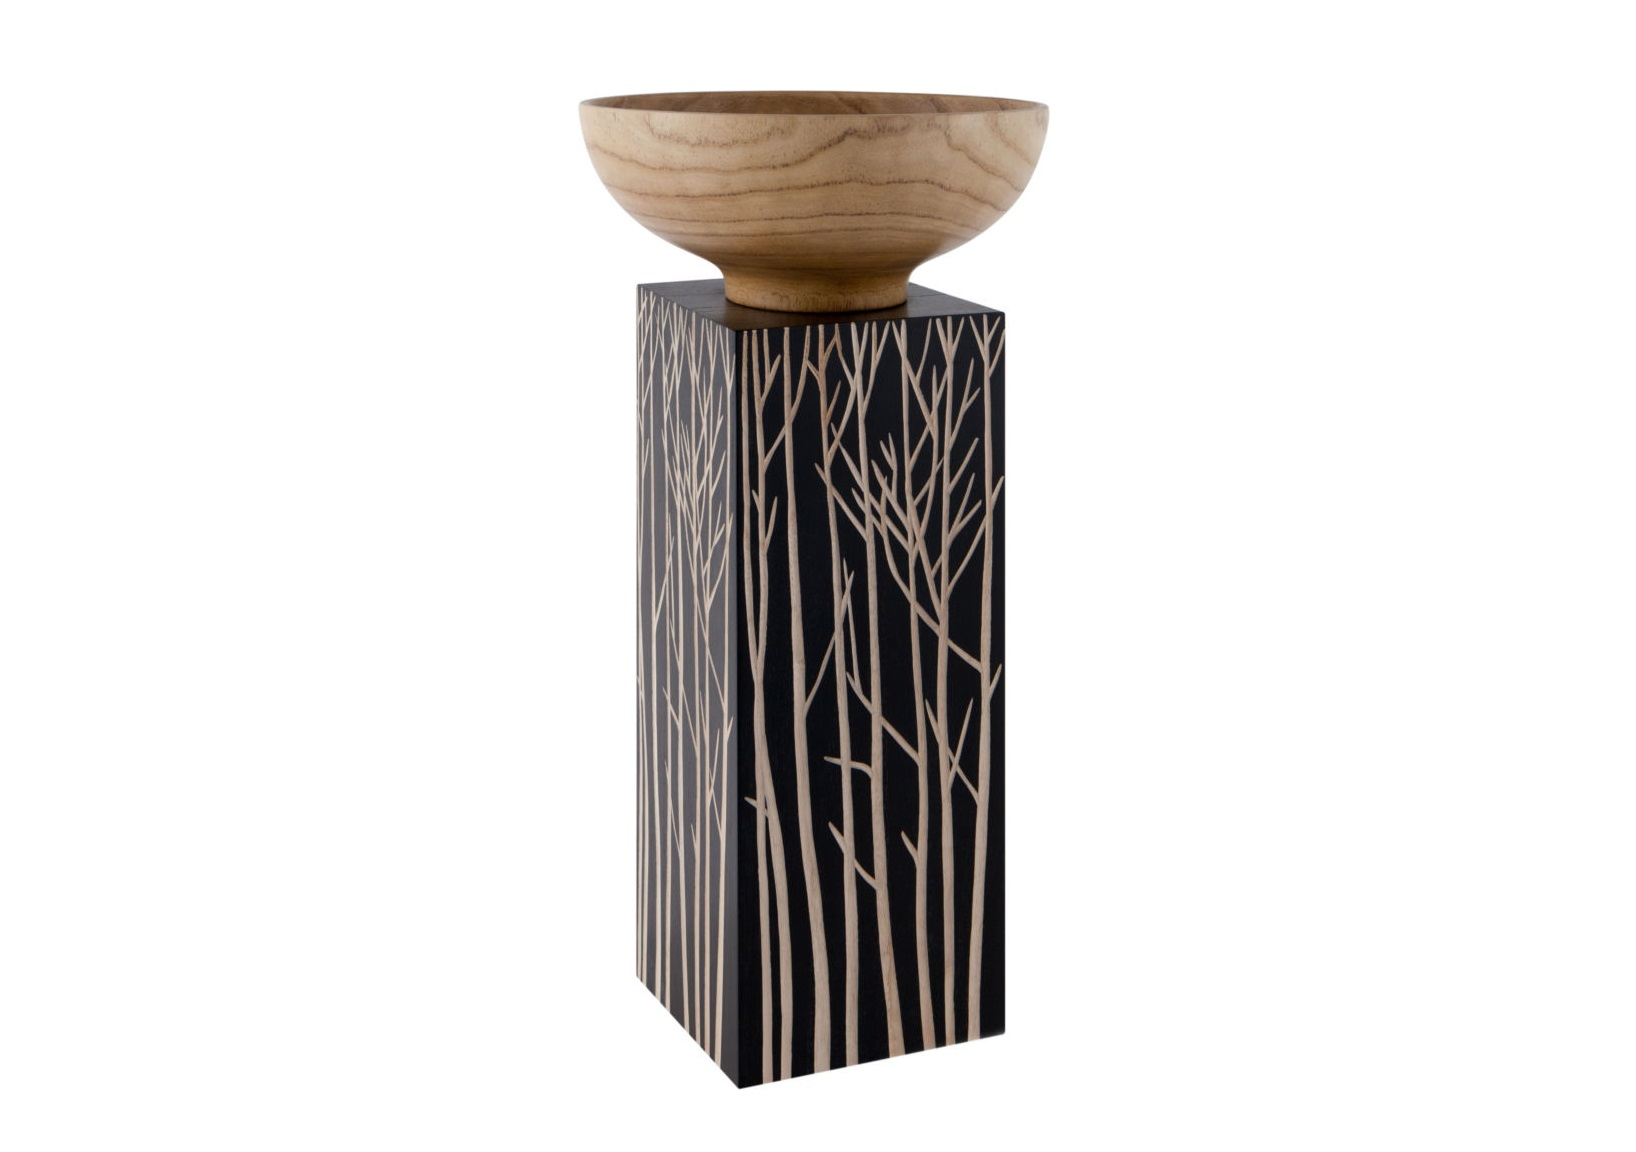 Ваза настольнаяДекоративные чаши<br><br><br>Material: Керамика<br>Width см: 34<br>Depth см: 34<br>Height см: 65